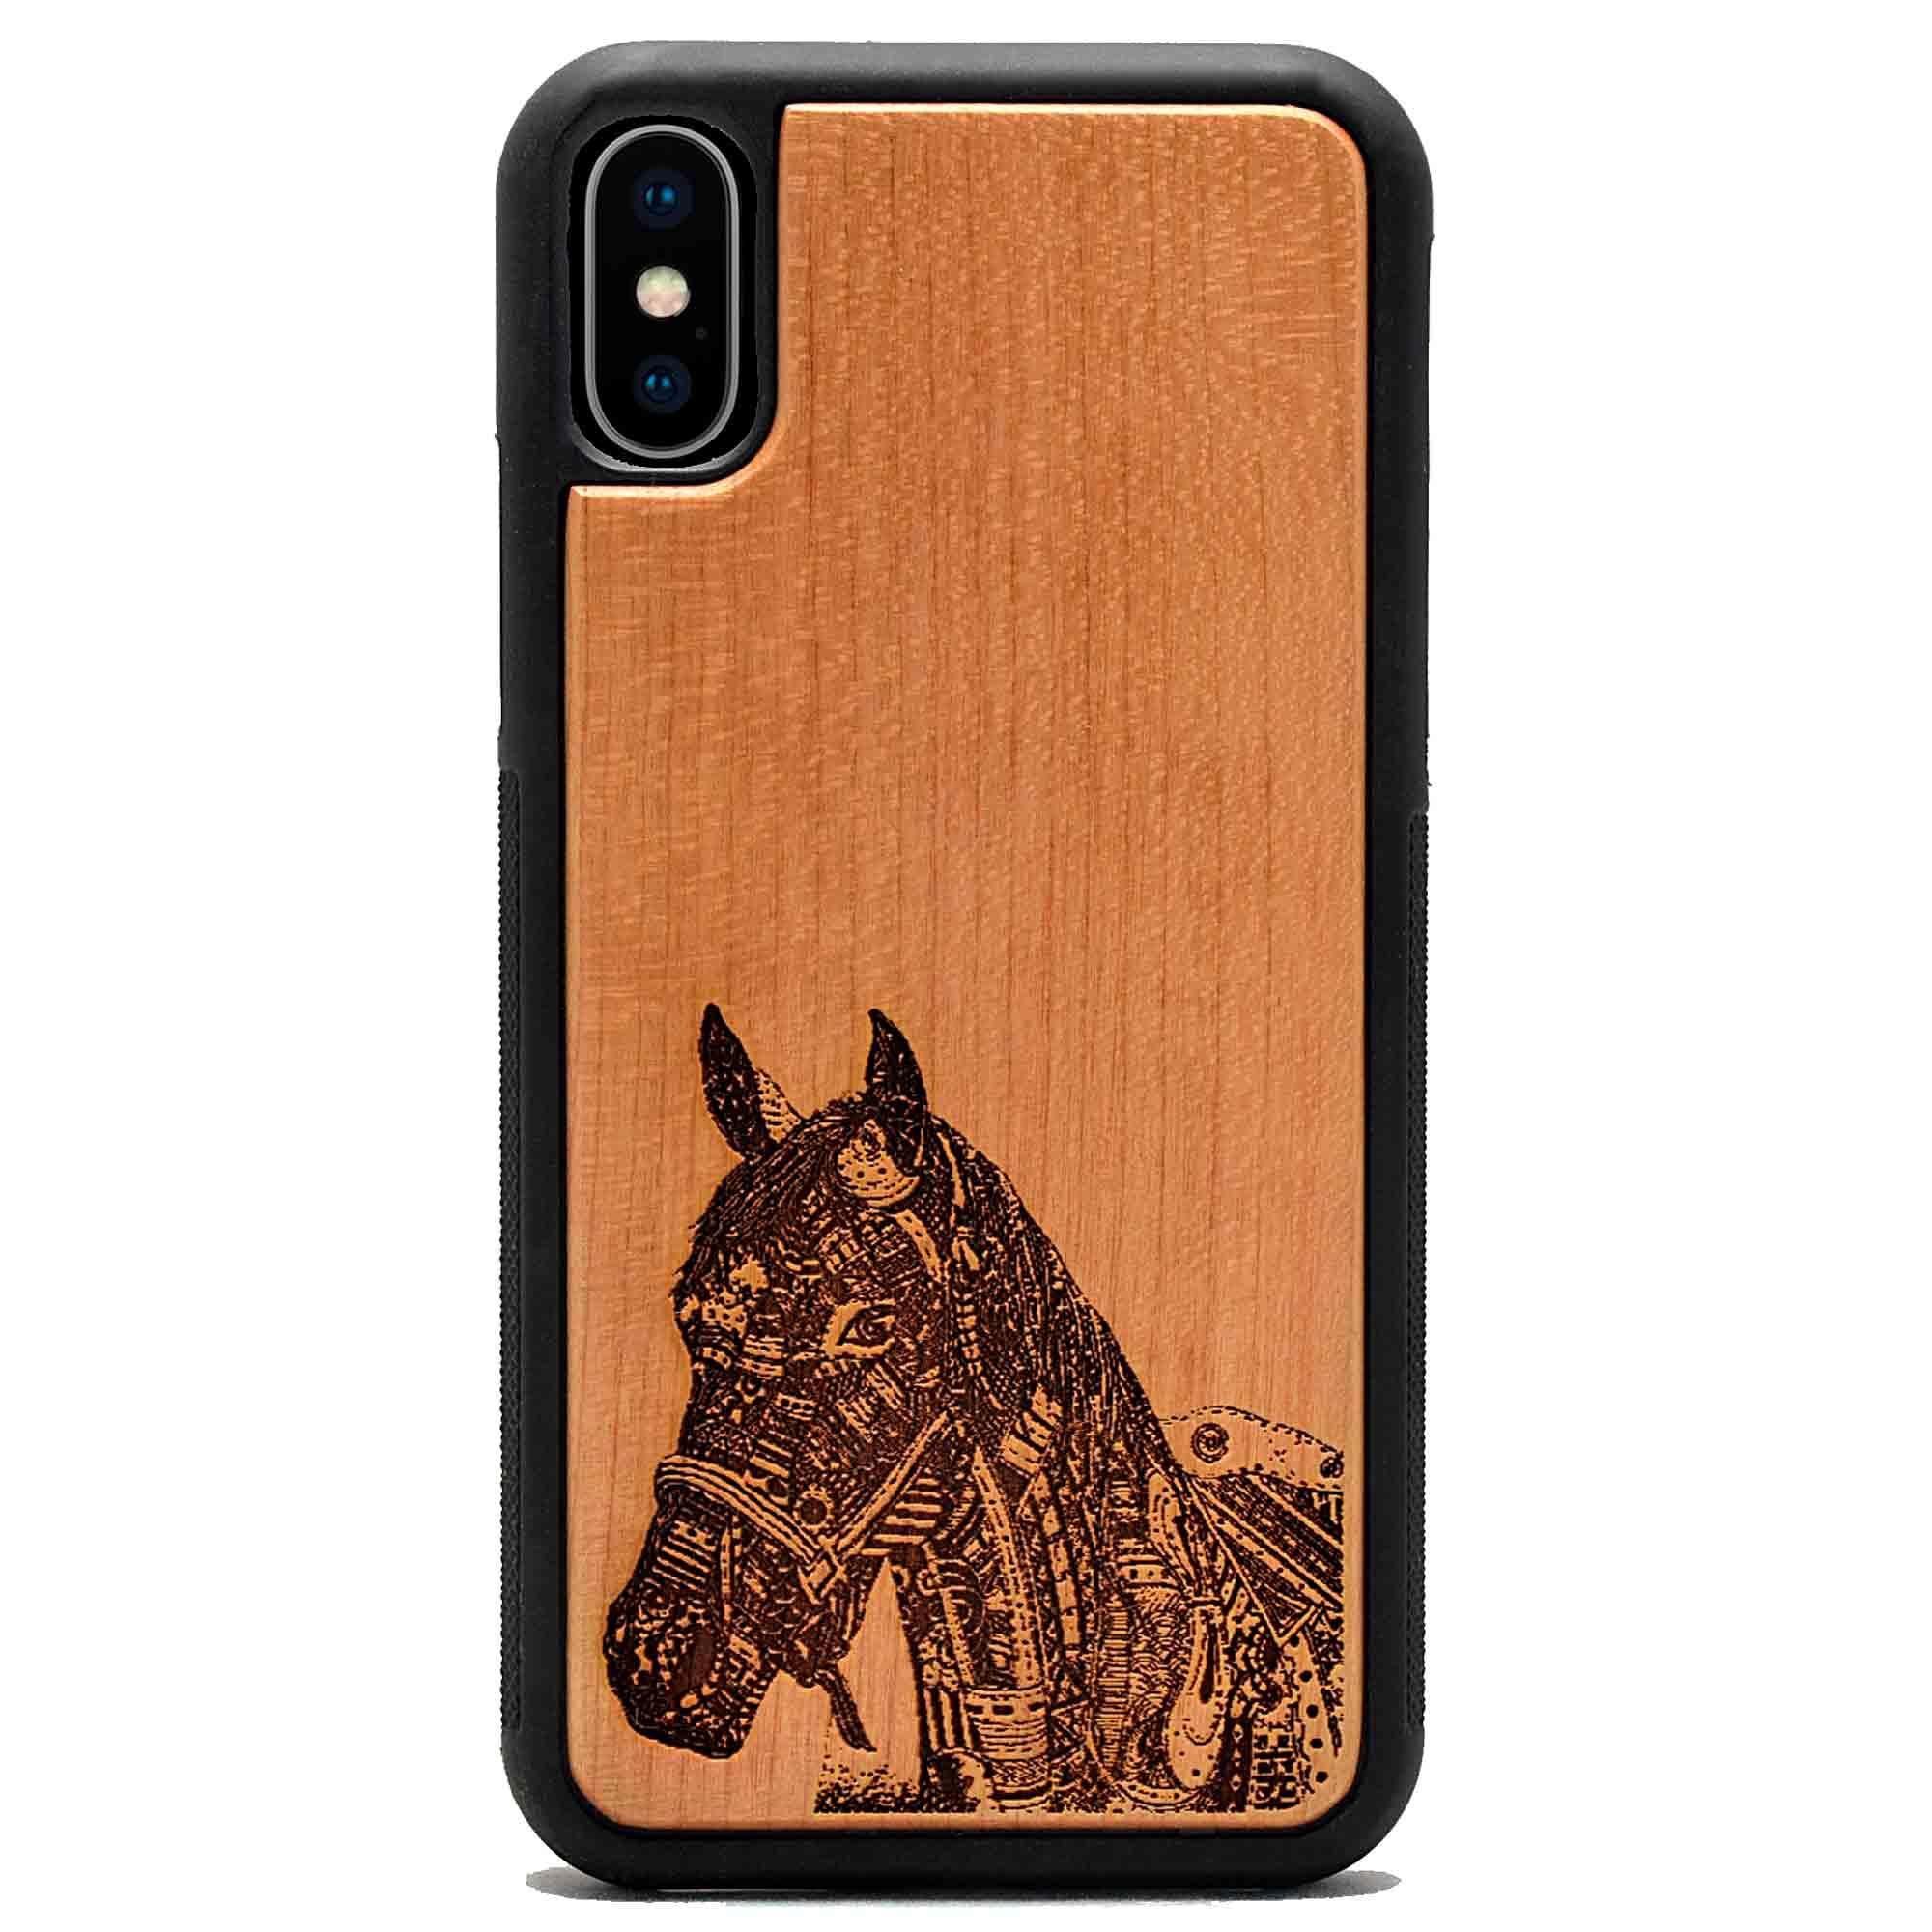 coque bois iphone gravure cheval mecanique apdran